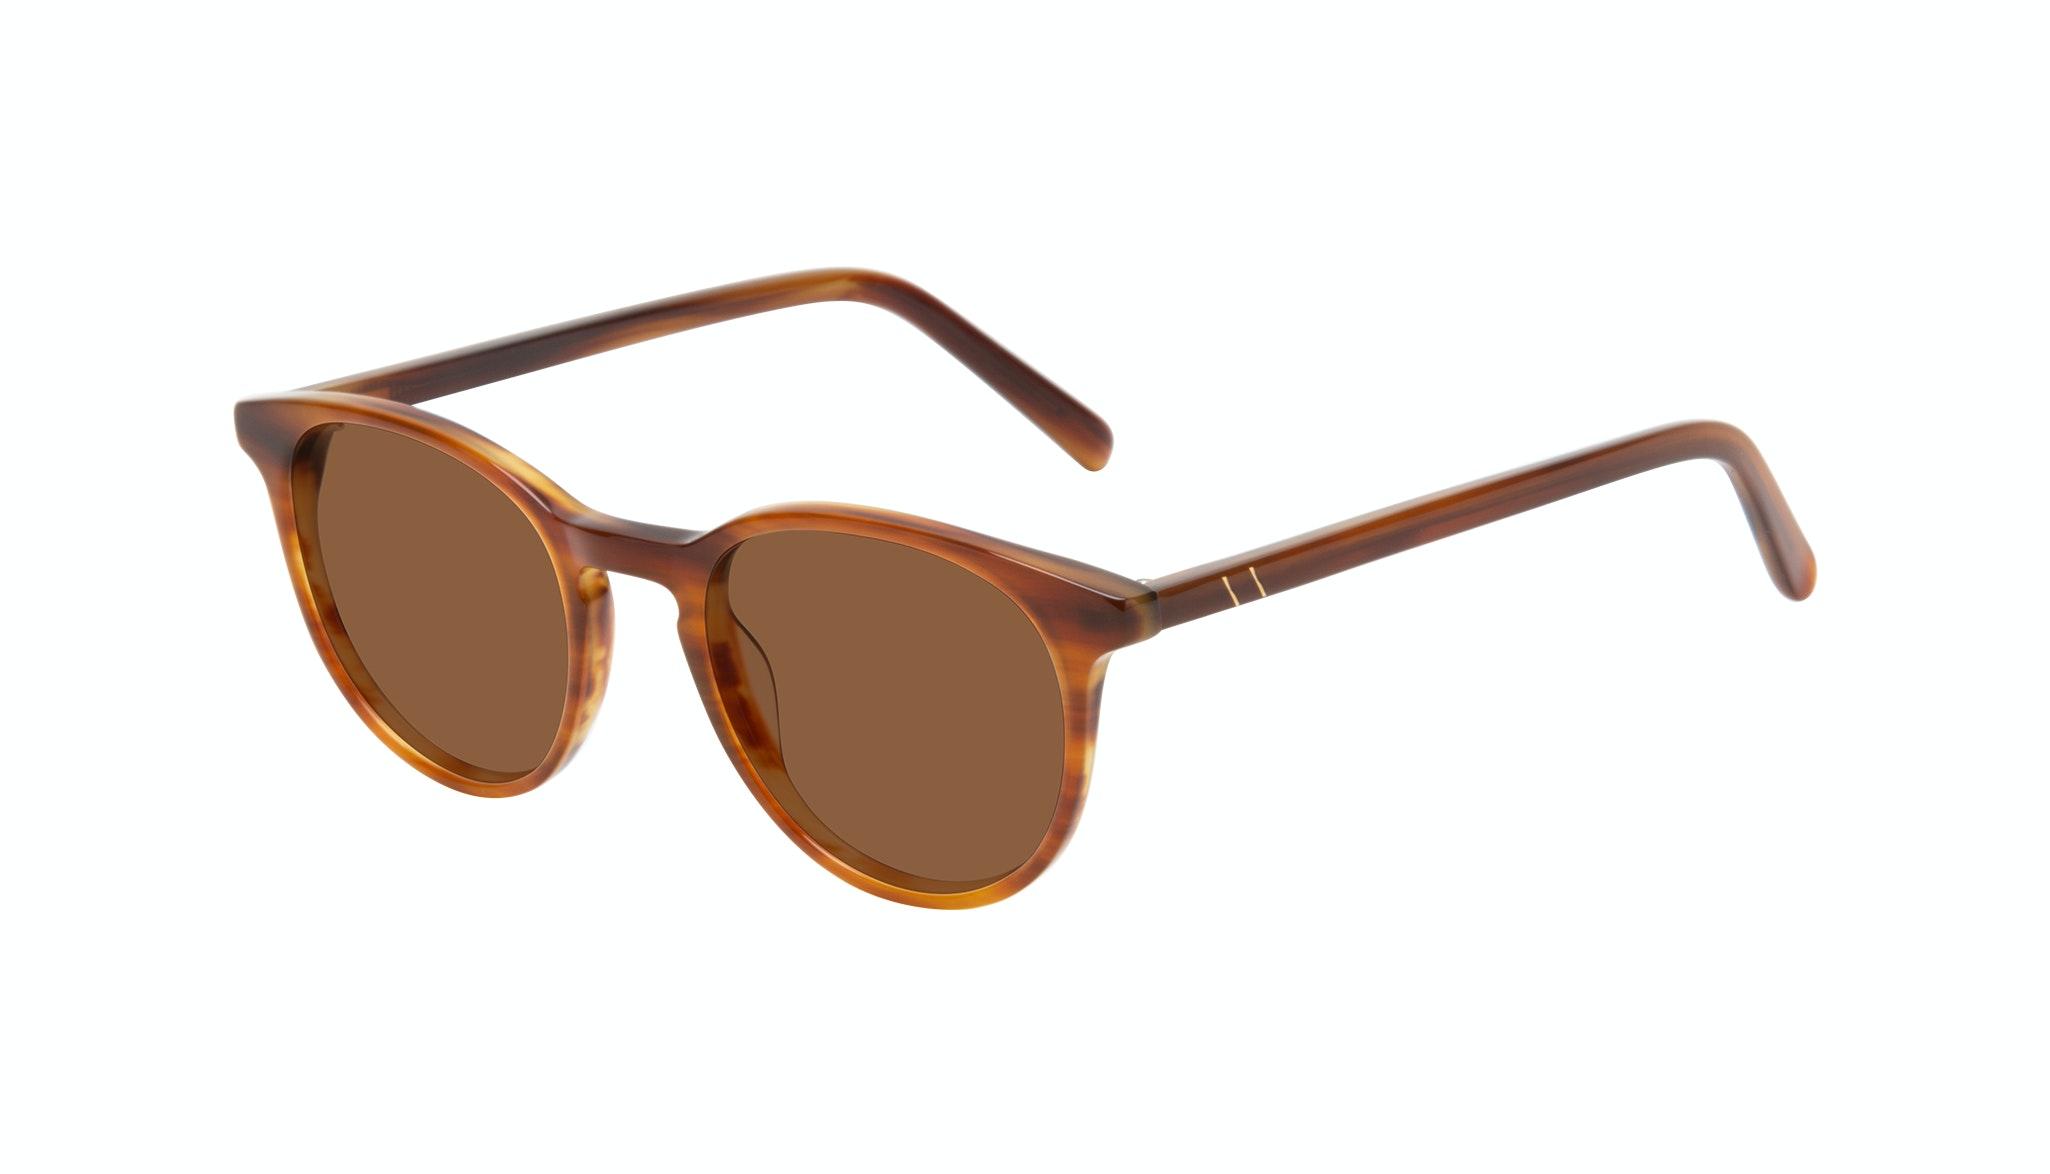 Affordable Fashion Glasses Round Sunglasses Men Select Havana Tilt